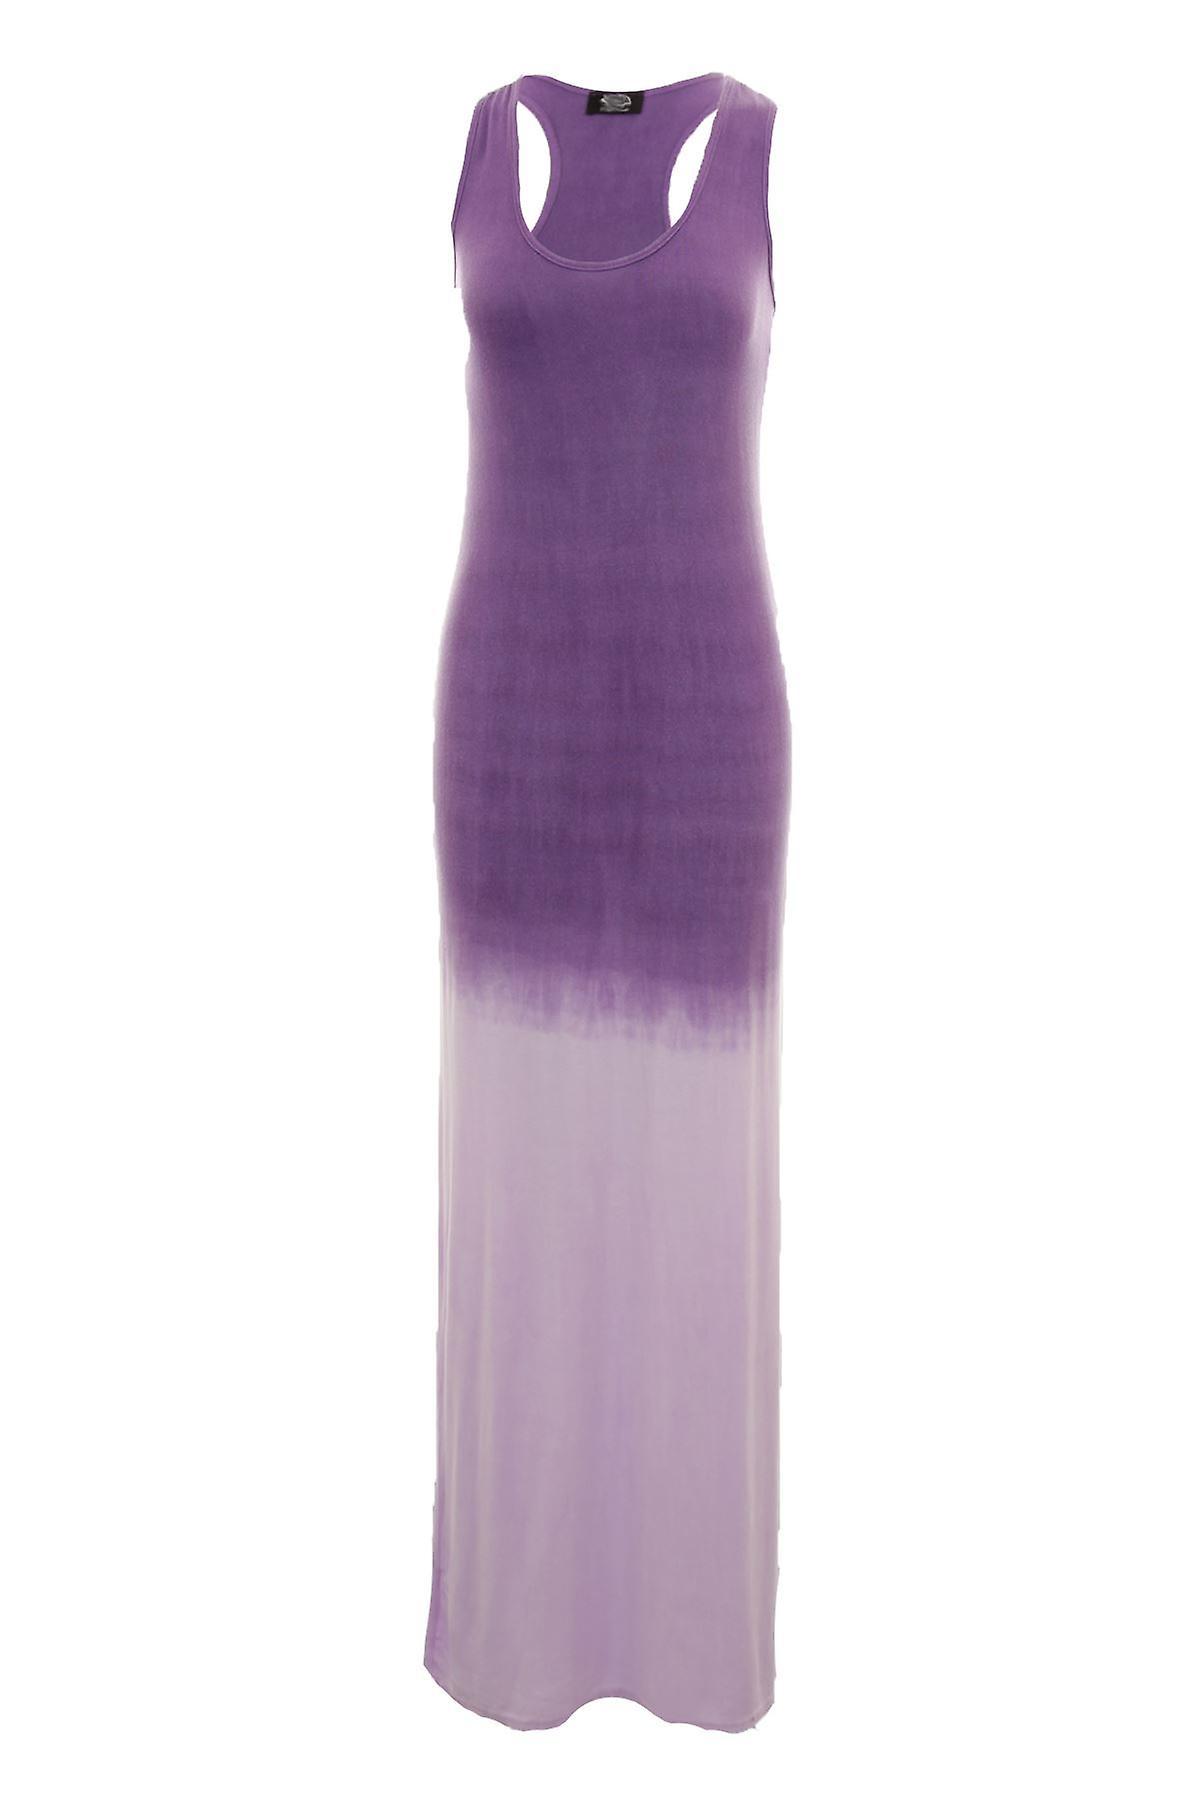 Ladies Sleeveless Round Neck Maxi Dip Dye Long Women's Dress